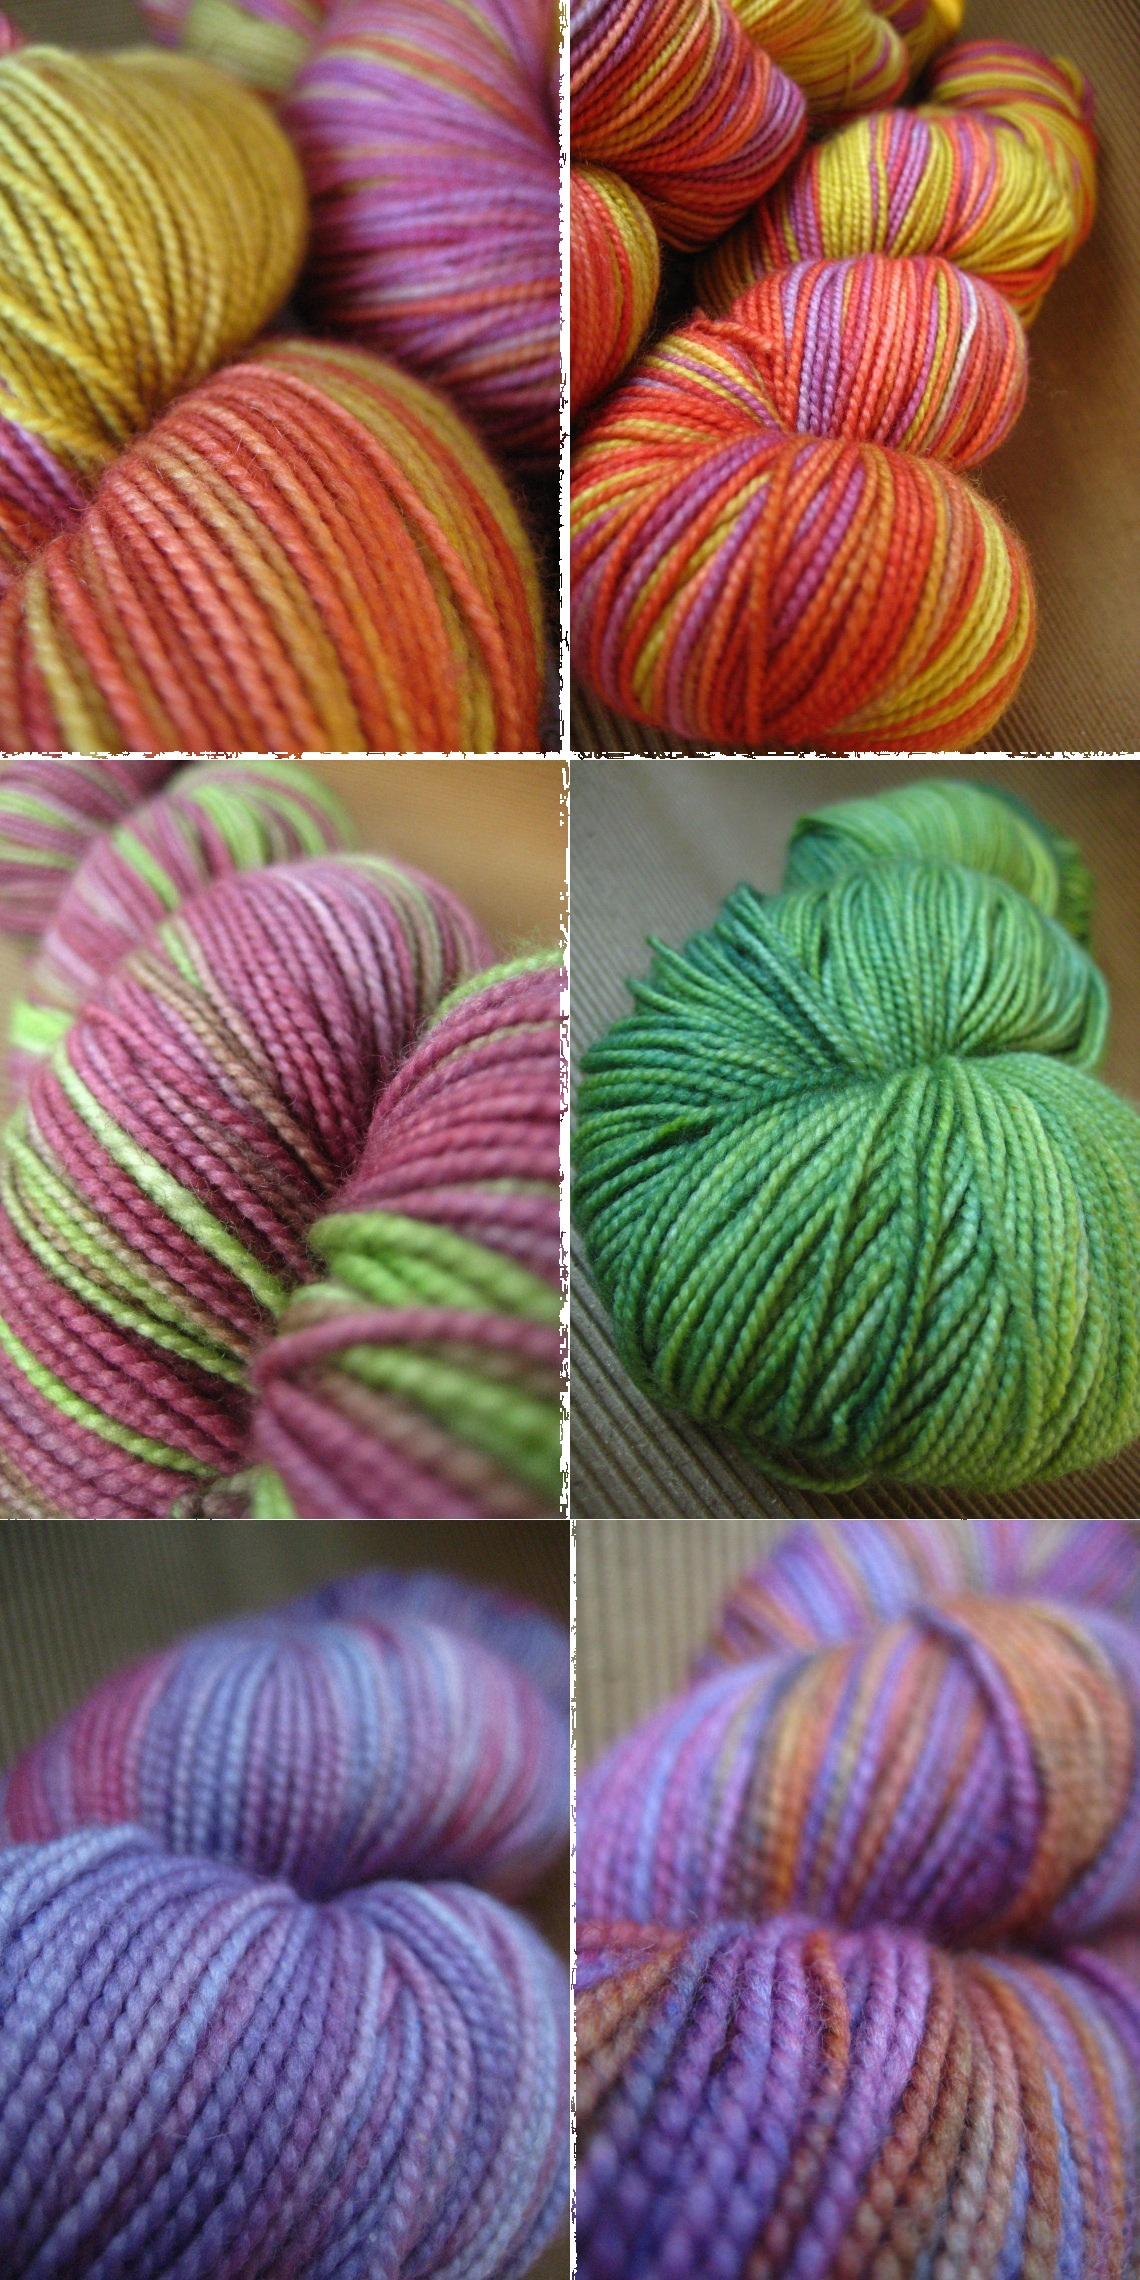 yarn, sock yarn, knitting, crochet, hand-dyed, handdye, indie dyer